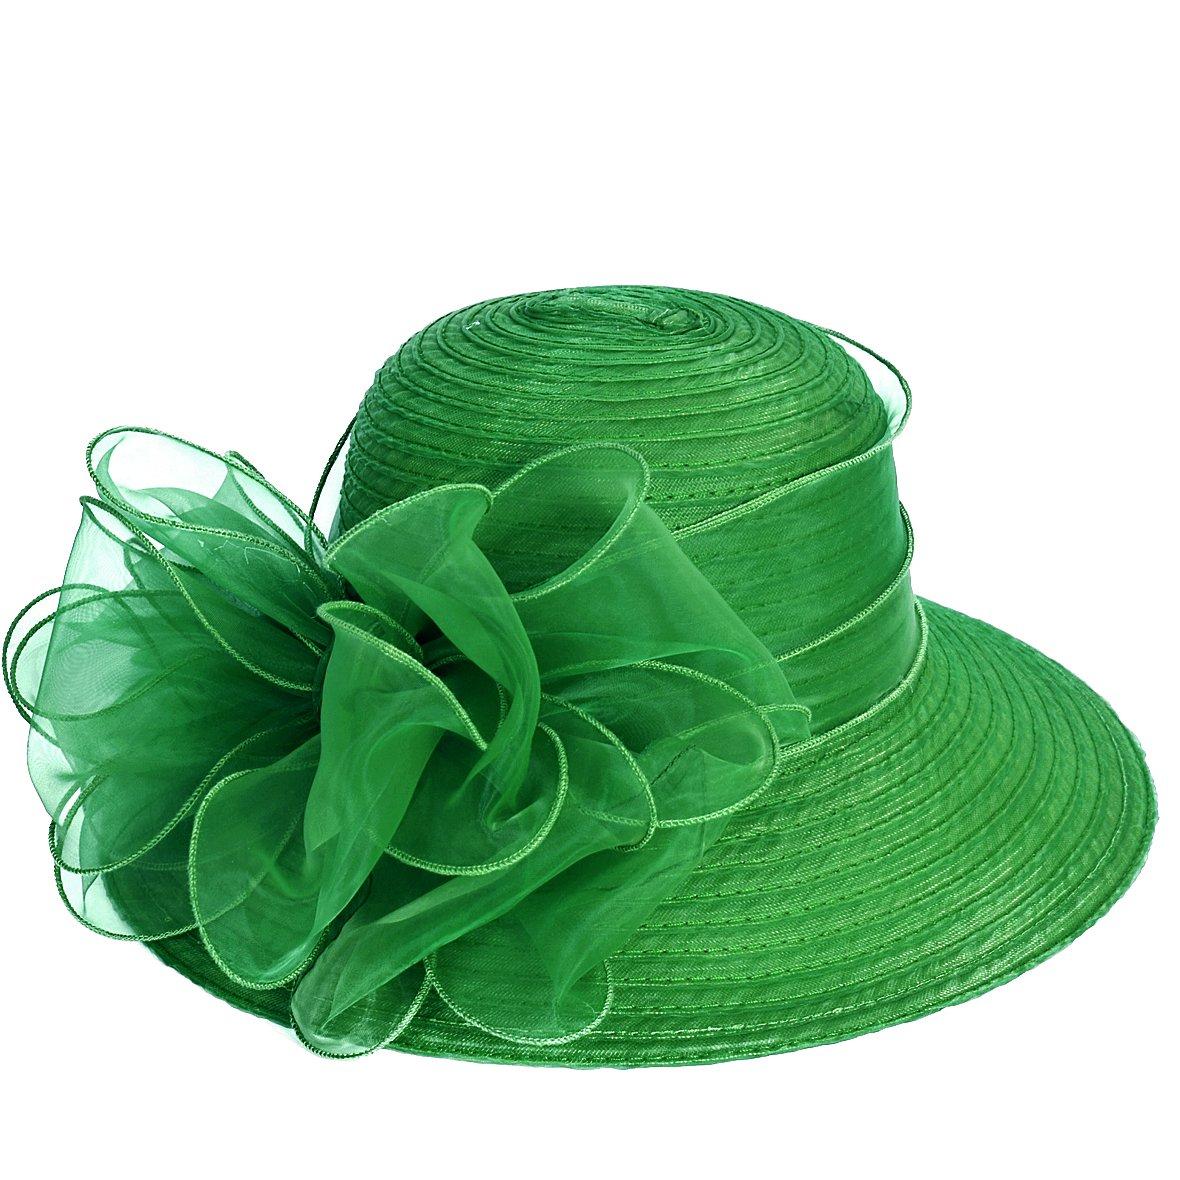 VECRY Lady Derby Dress Church Cloche Hat Bow Bucket Wedding Bowler Hats (Green, Medium) by VECRY (Image #3)